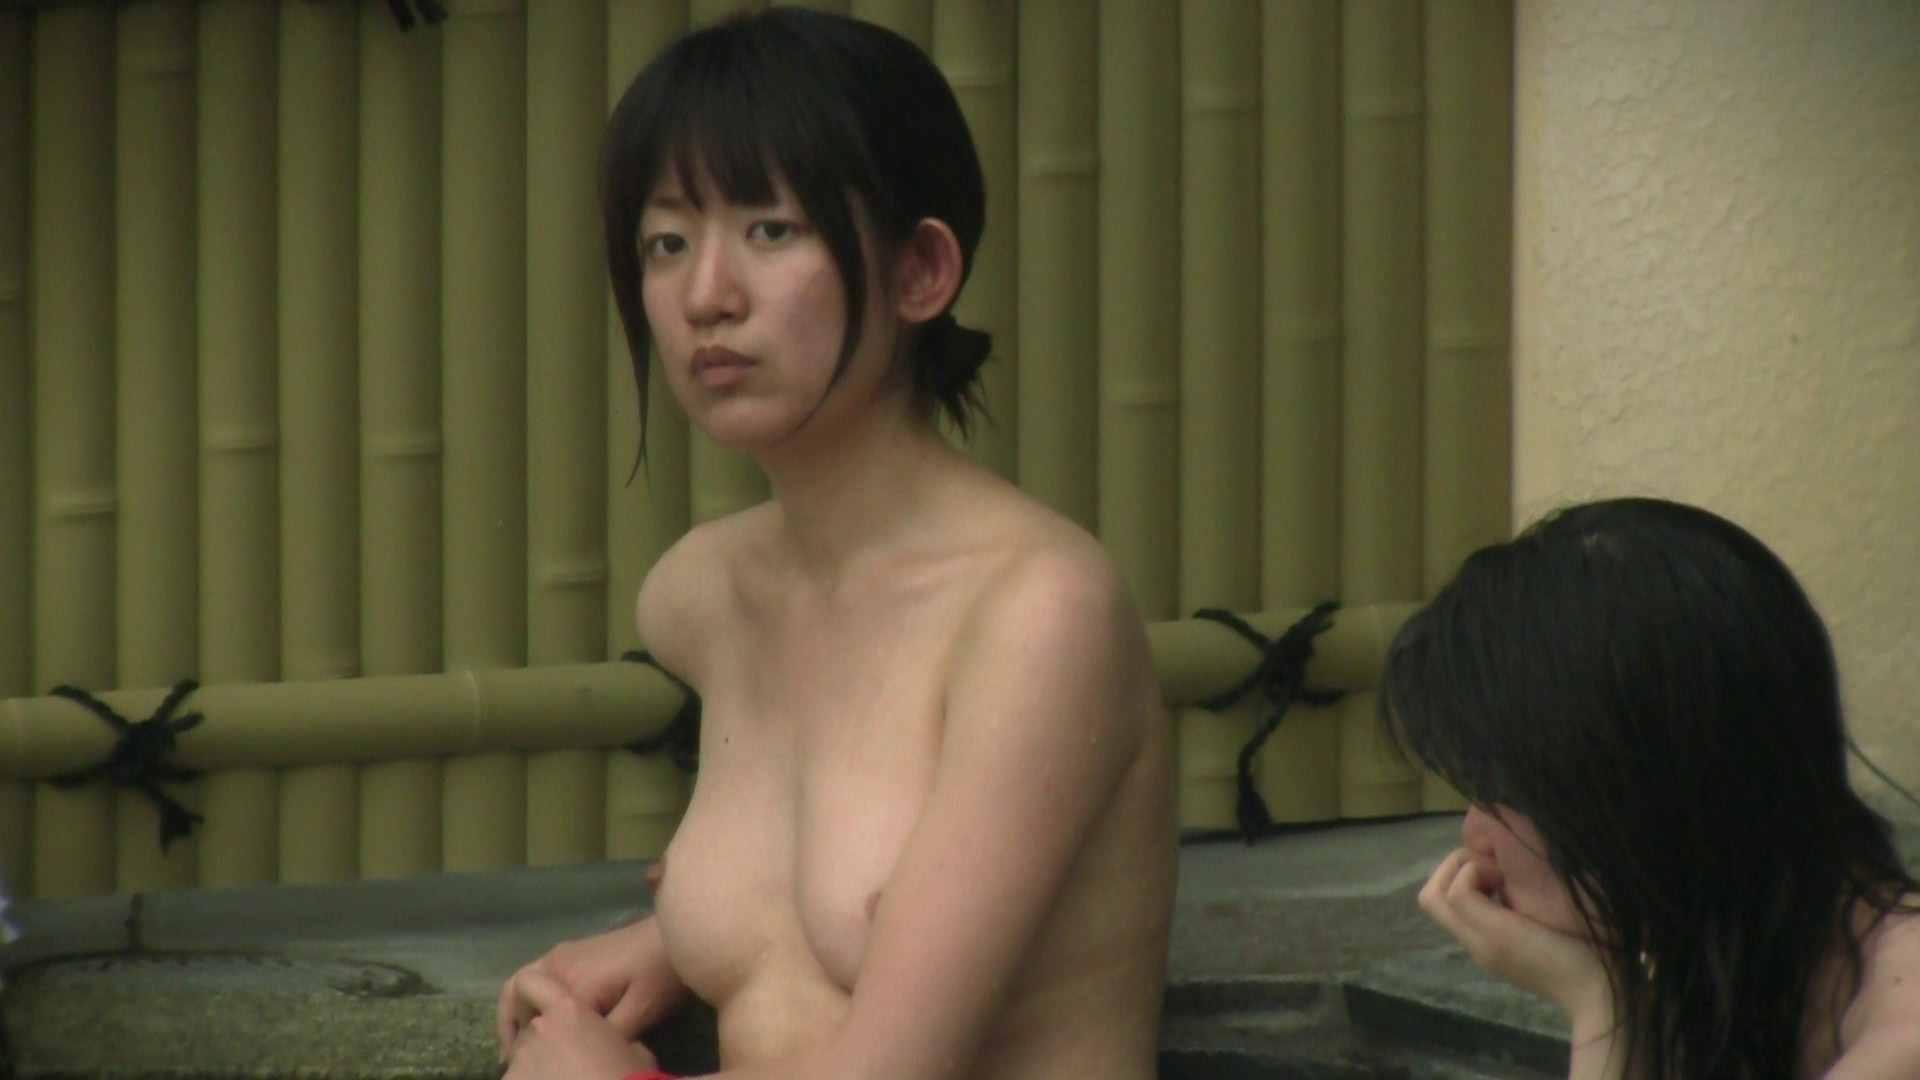 Aquaな露天風呂Vol.144 盗撮 | HなOL  93pic 9